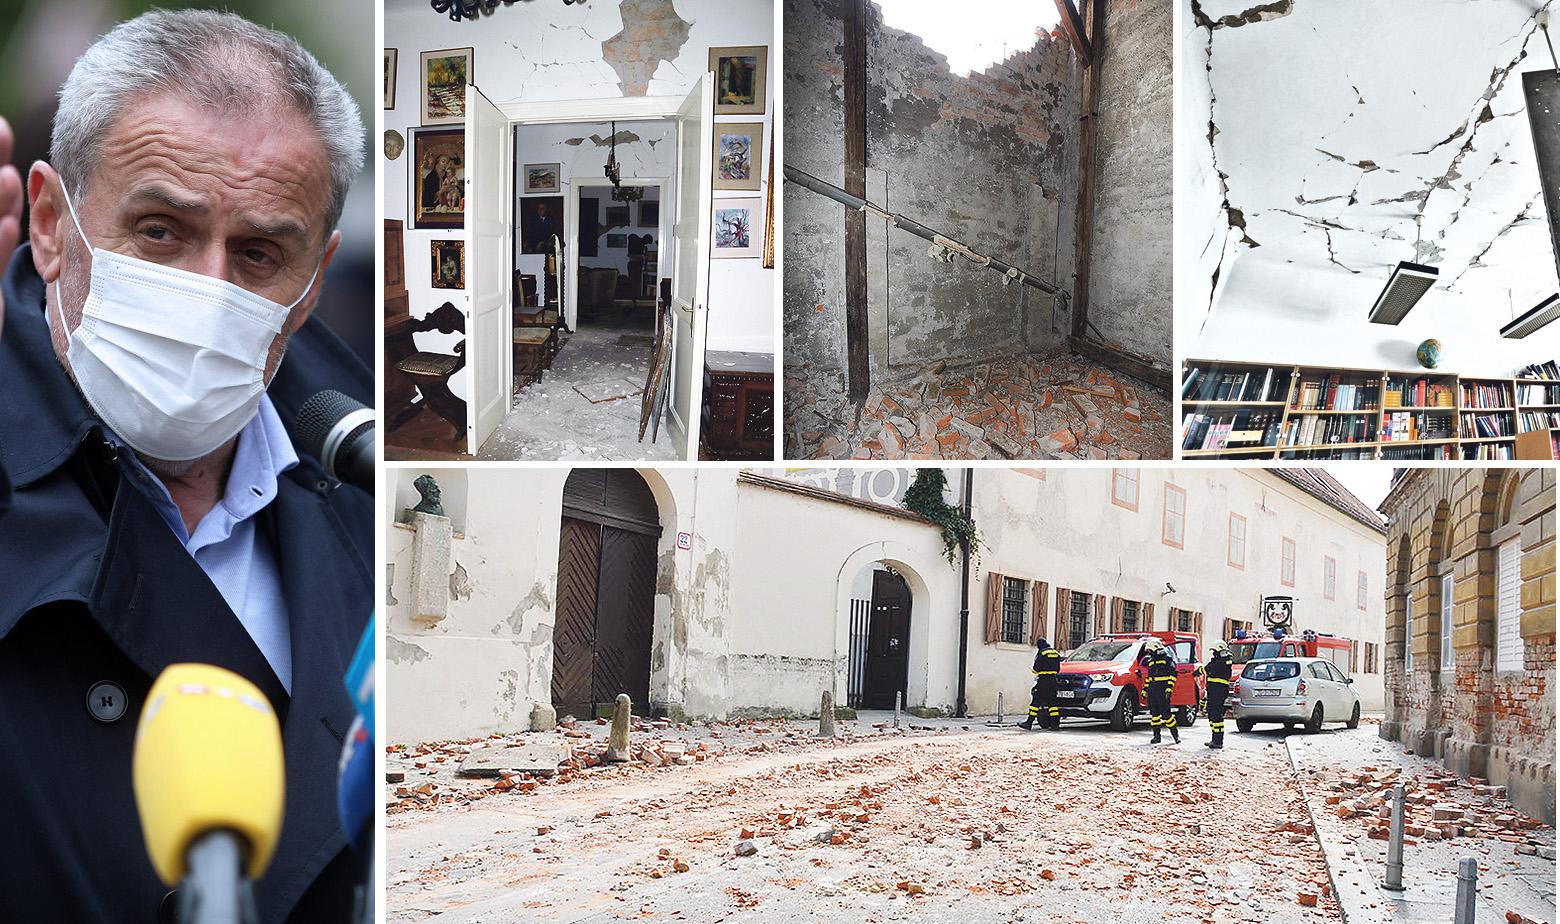 Milan Bandić i šteta u Zagrebu nakon potresa